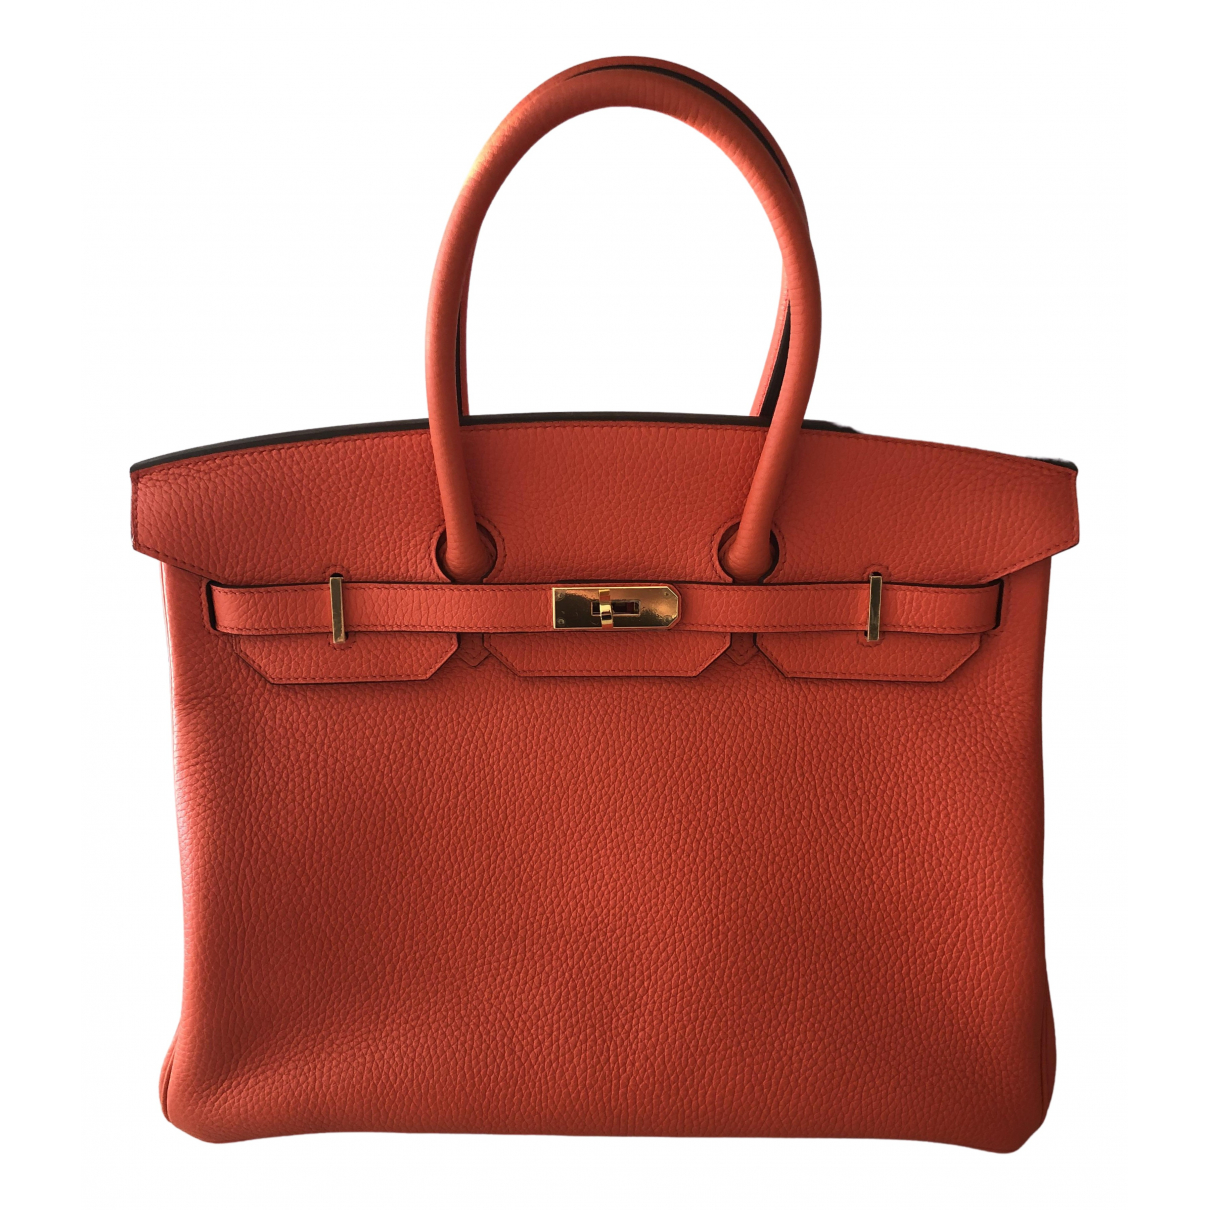 Hermes - Sac a main Birkin 35 pour femme en cuir - orange